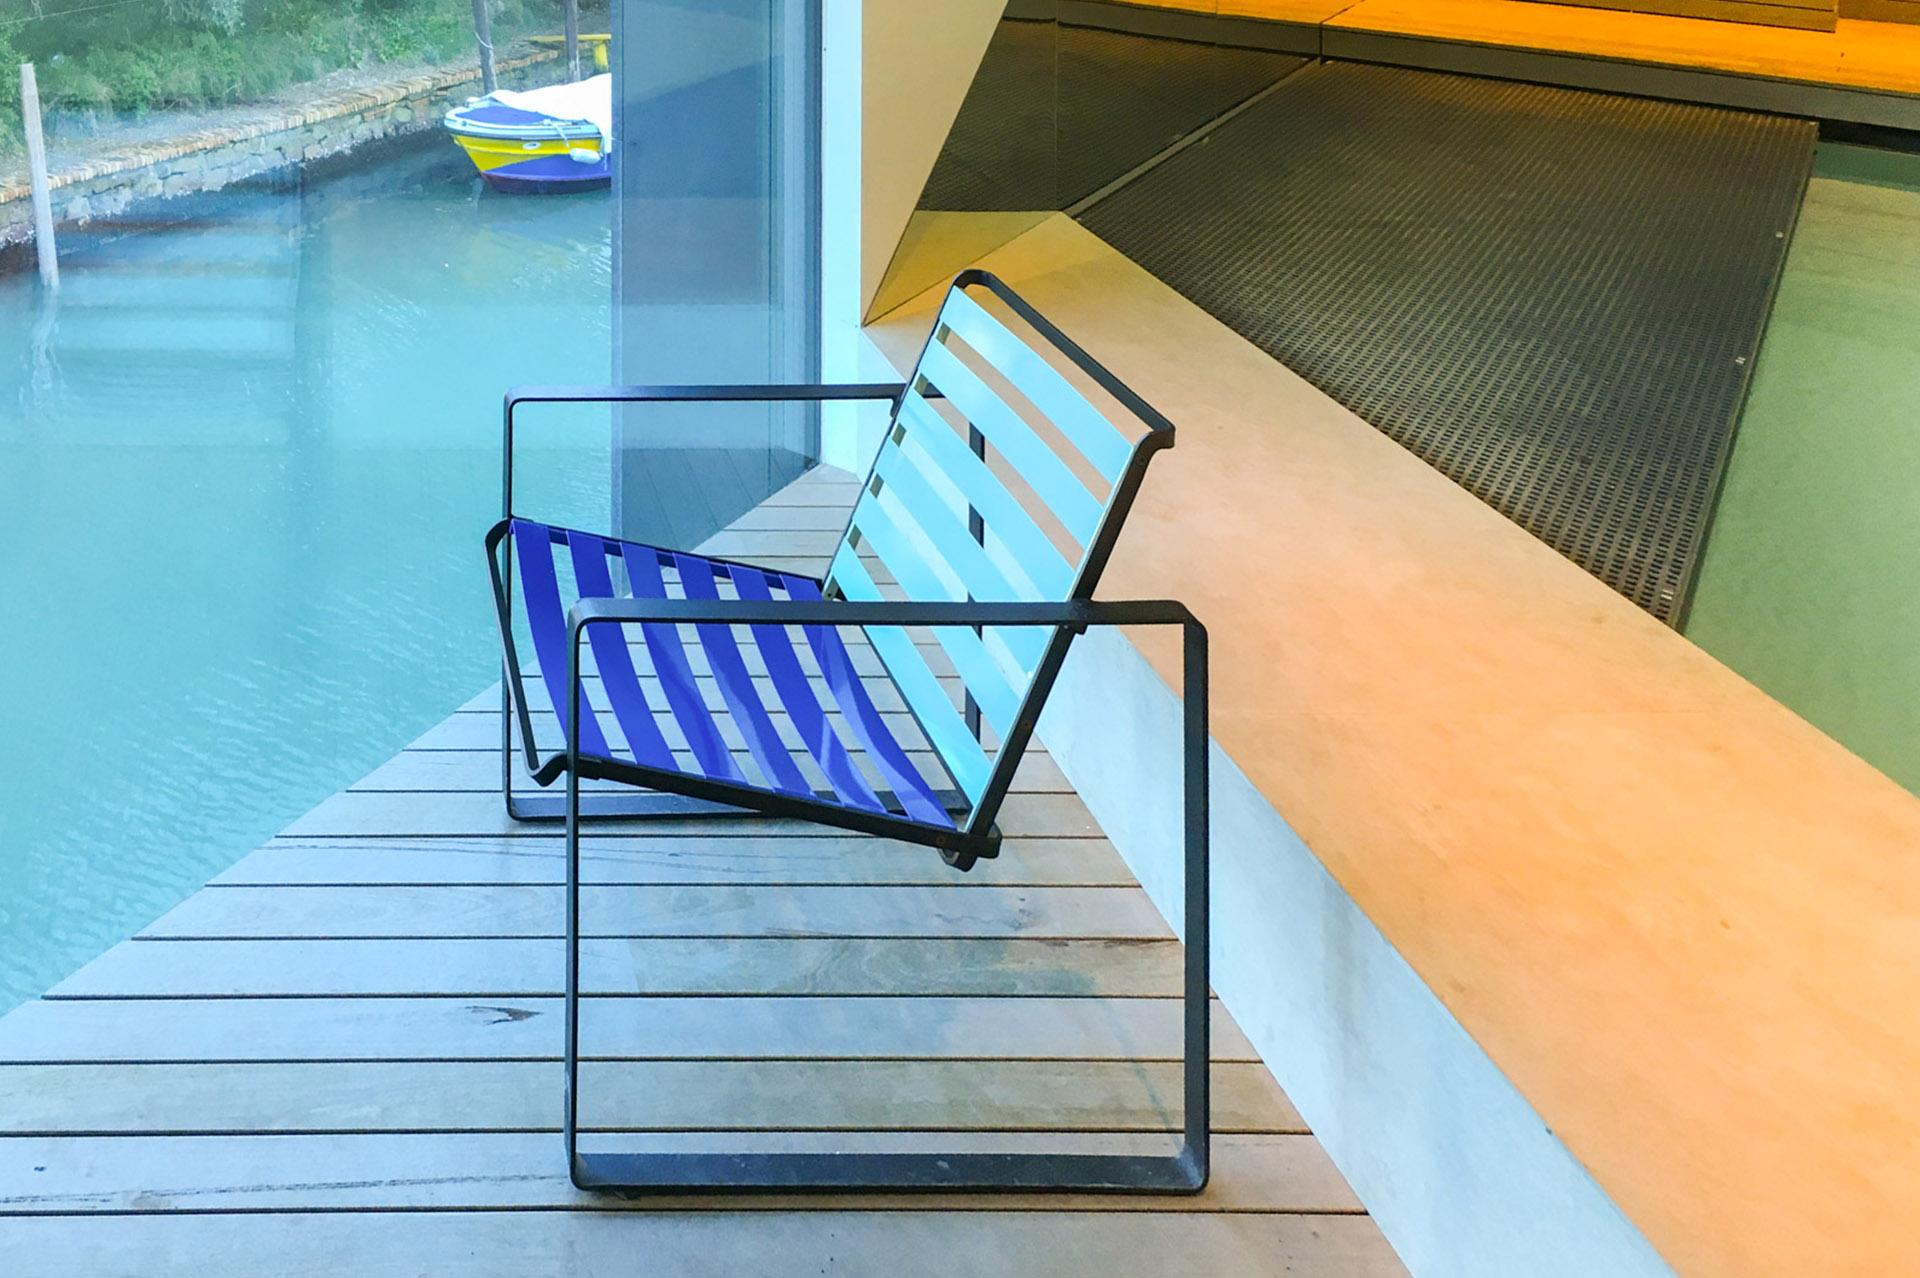 Australia-Pavilion-Venice-Biennale-2016-The-Pool-Inexhibit-02_chair.jpg